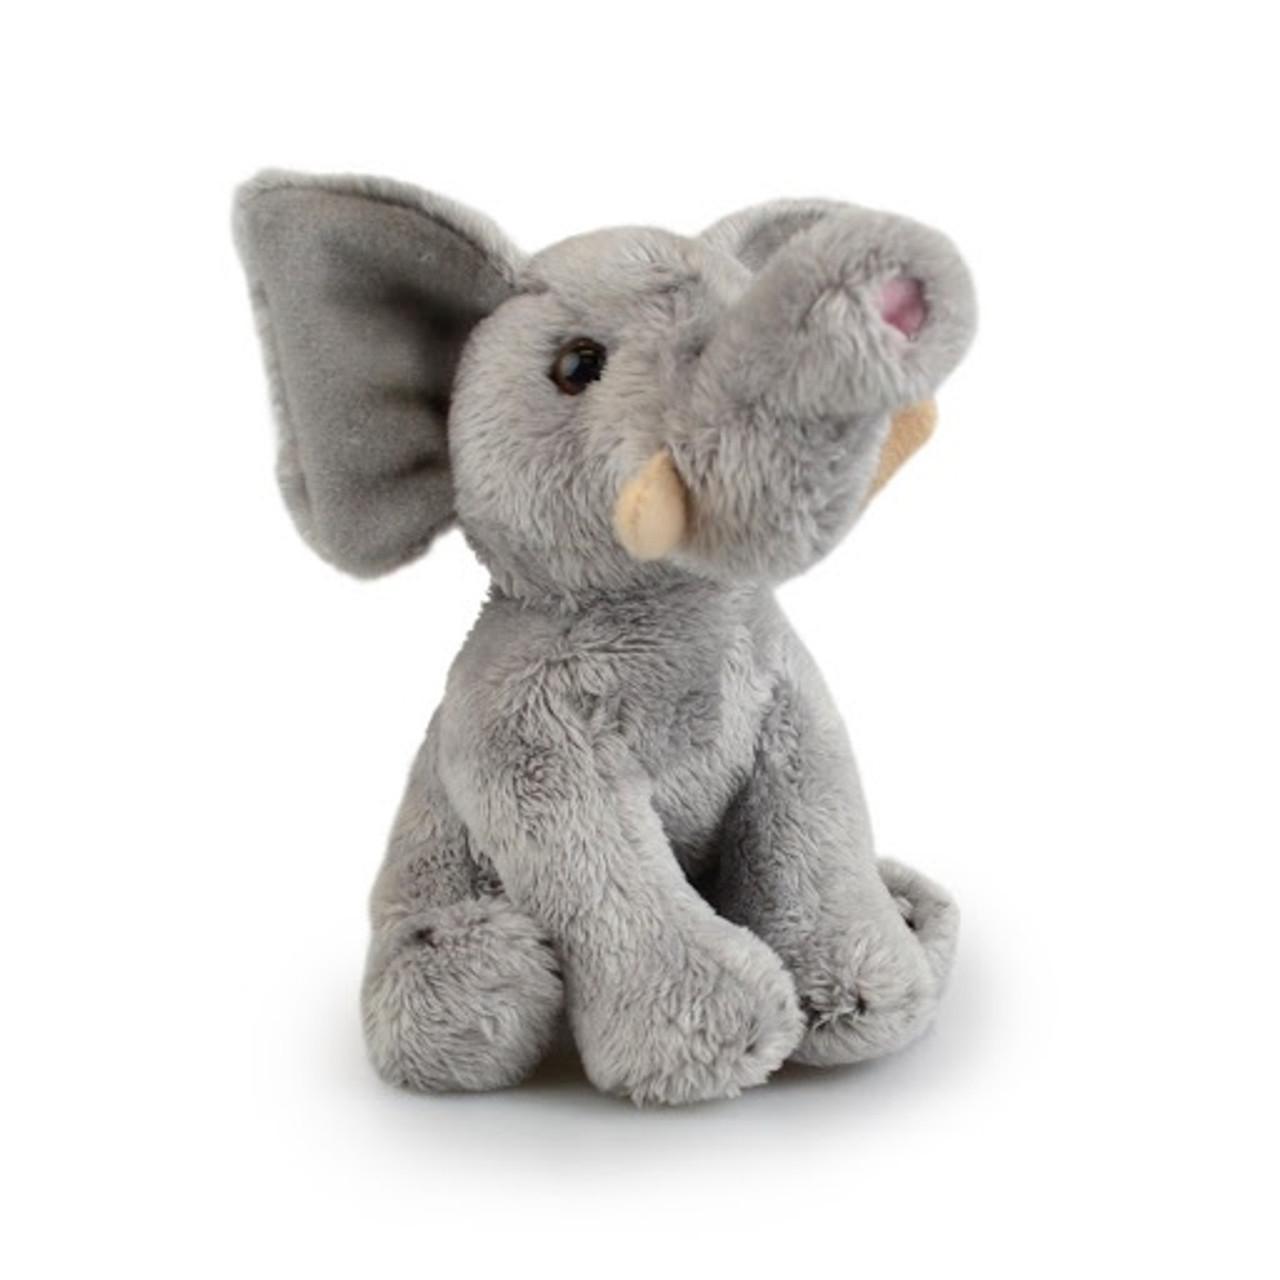 Korimco Lil Friends Plush Toy 18cm - ELEPHANT